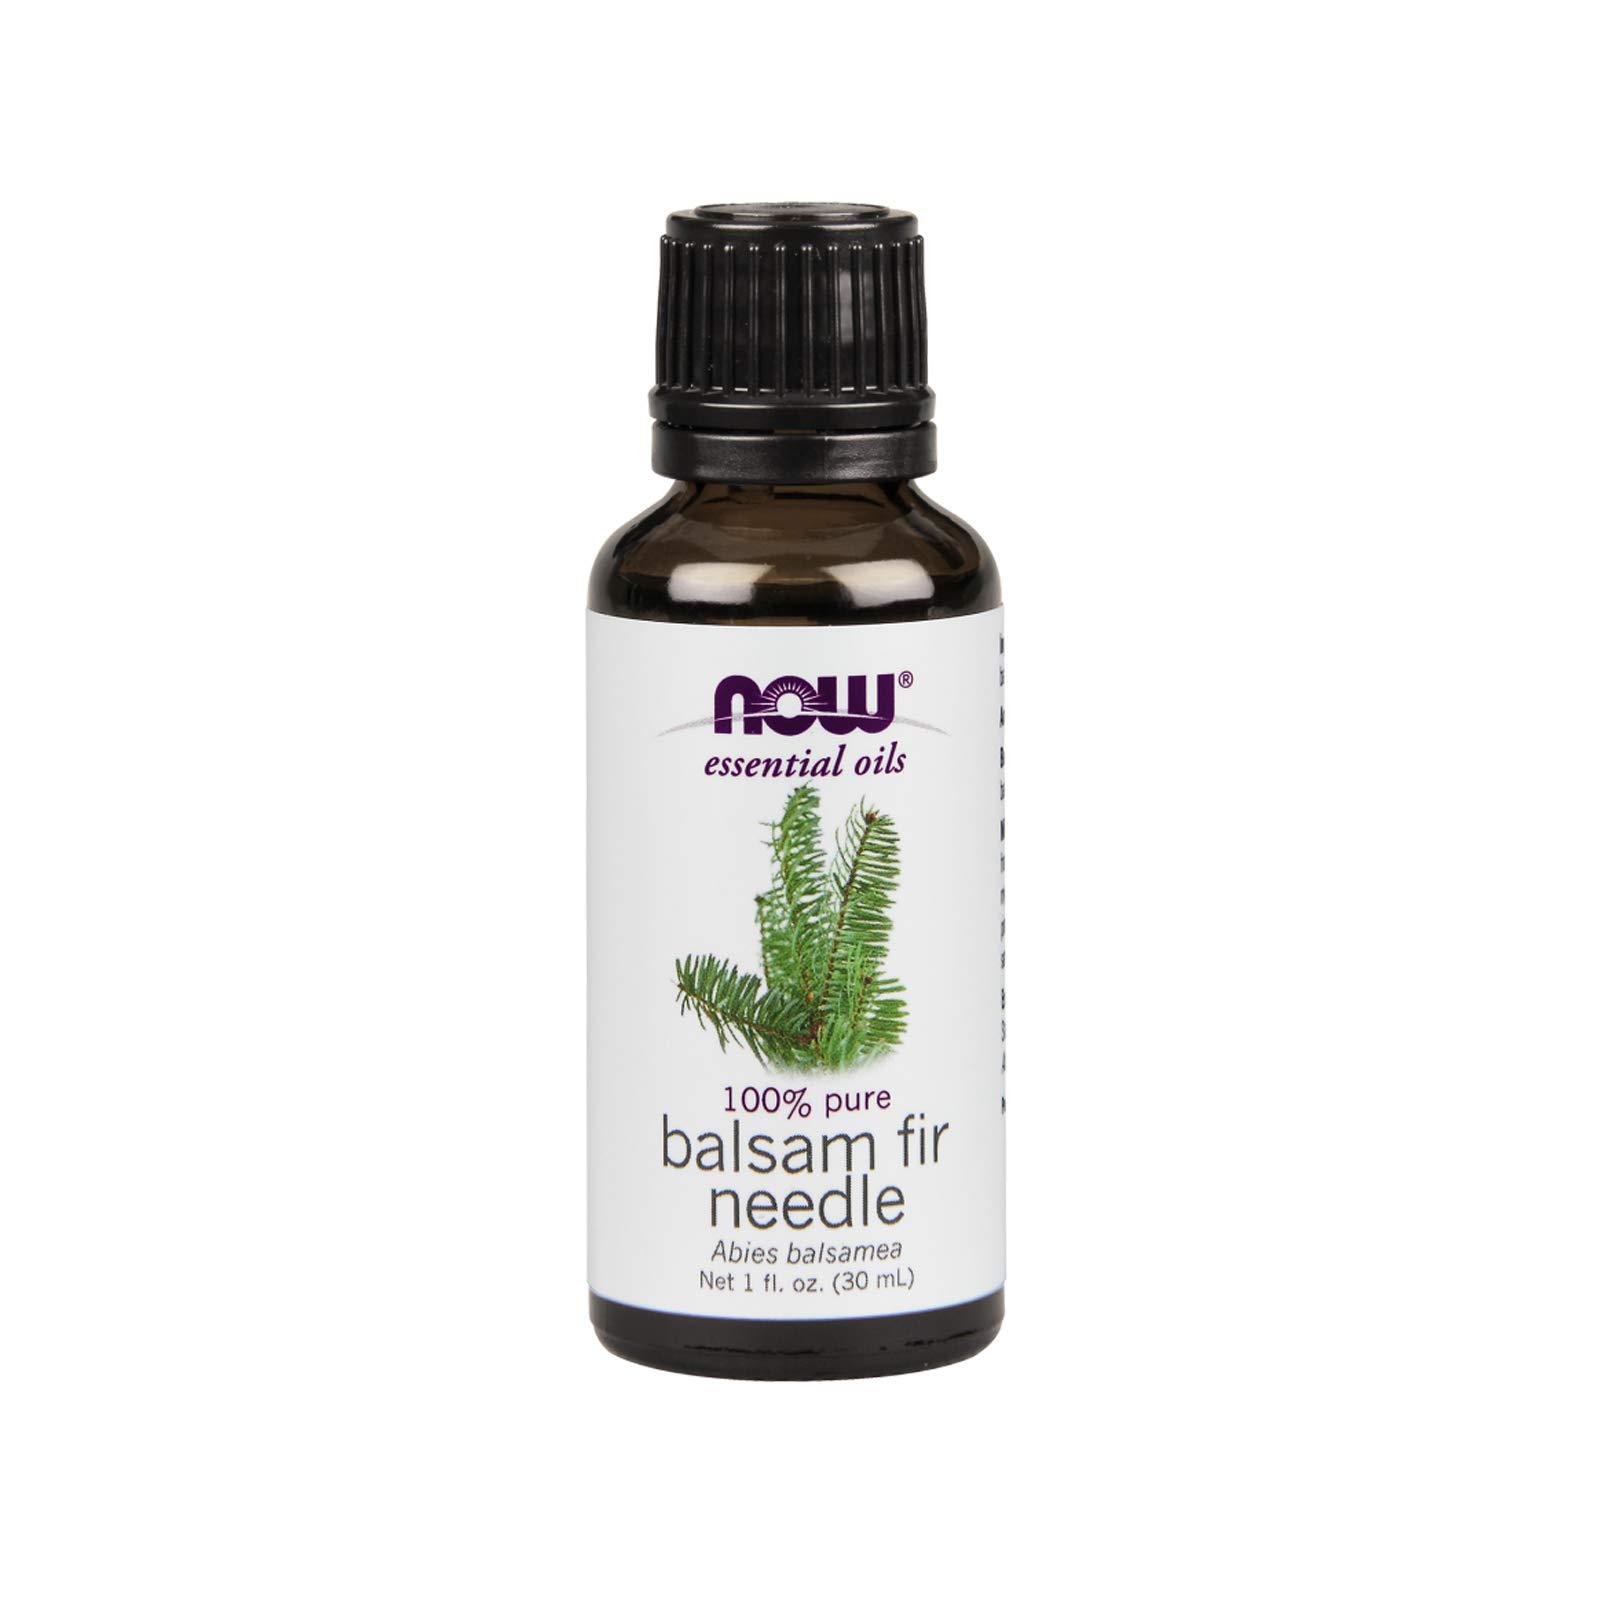 NOW Essential Oils, Balsam Fir Needle Oil, 1-Ounce